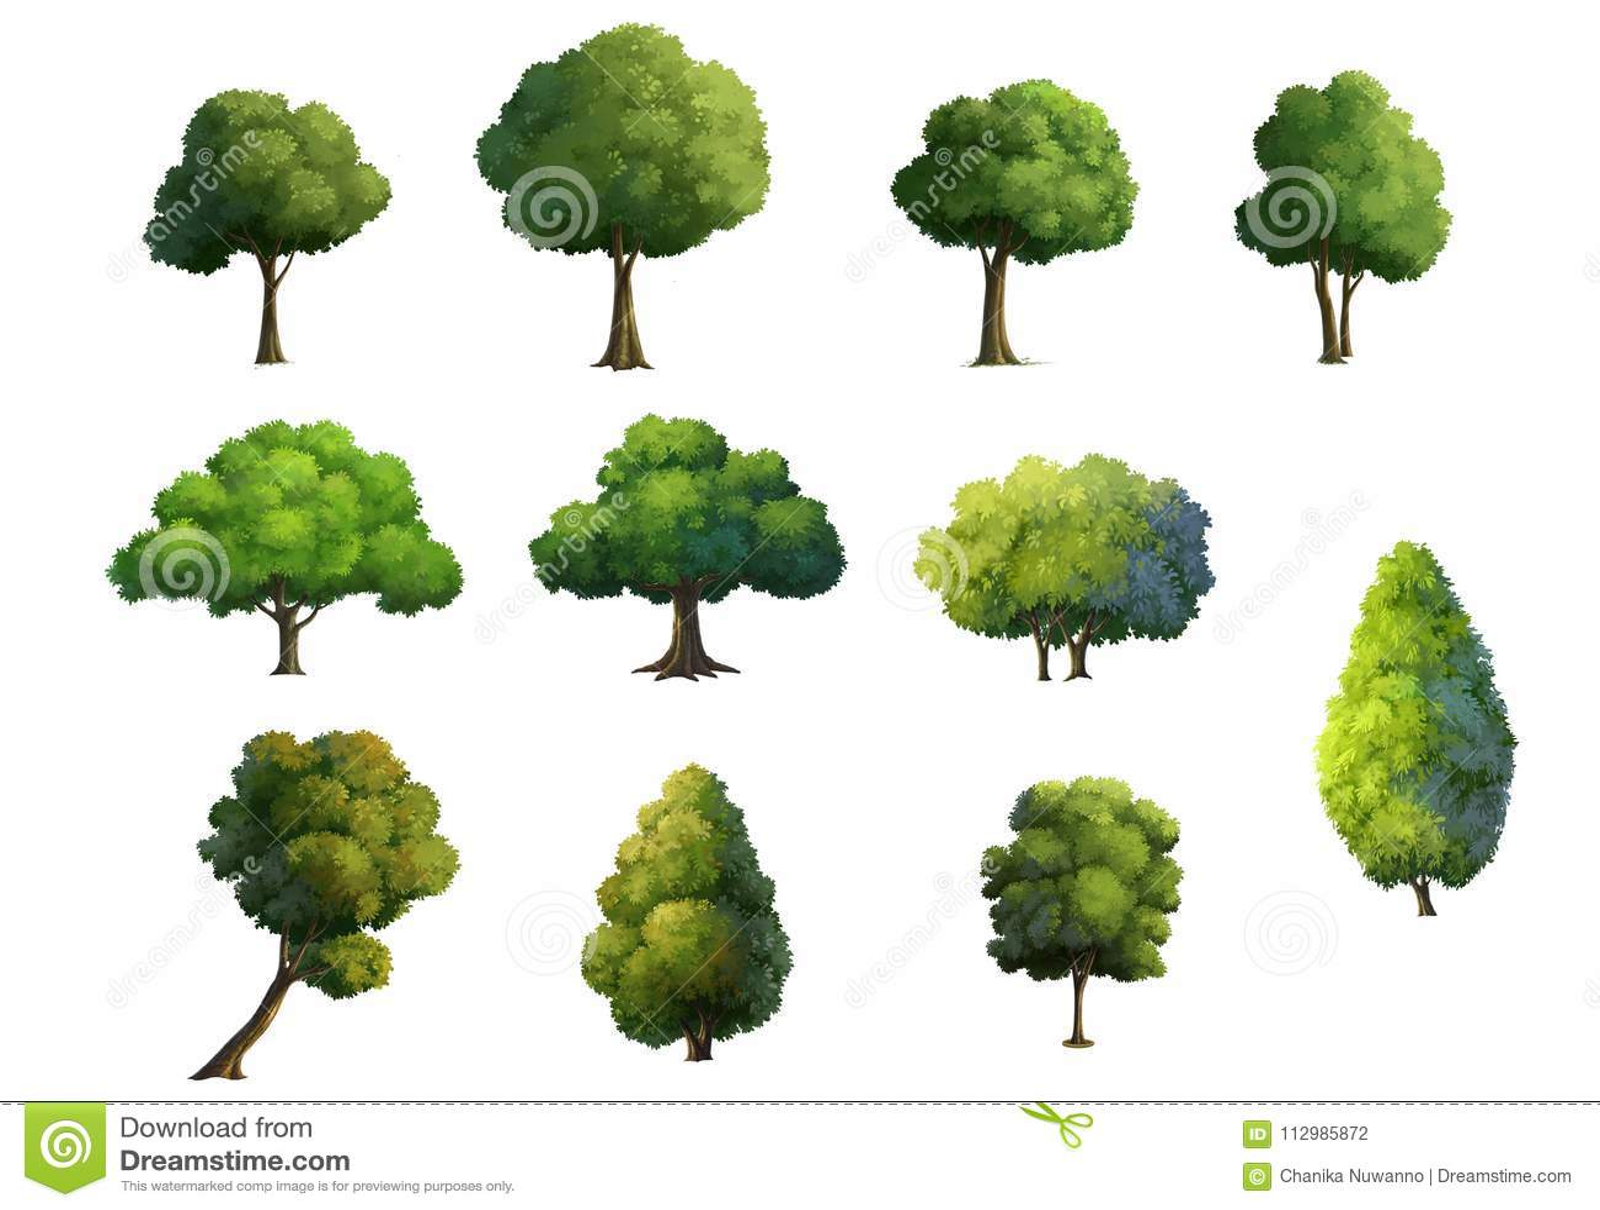 Illustration of trees isolated on white background